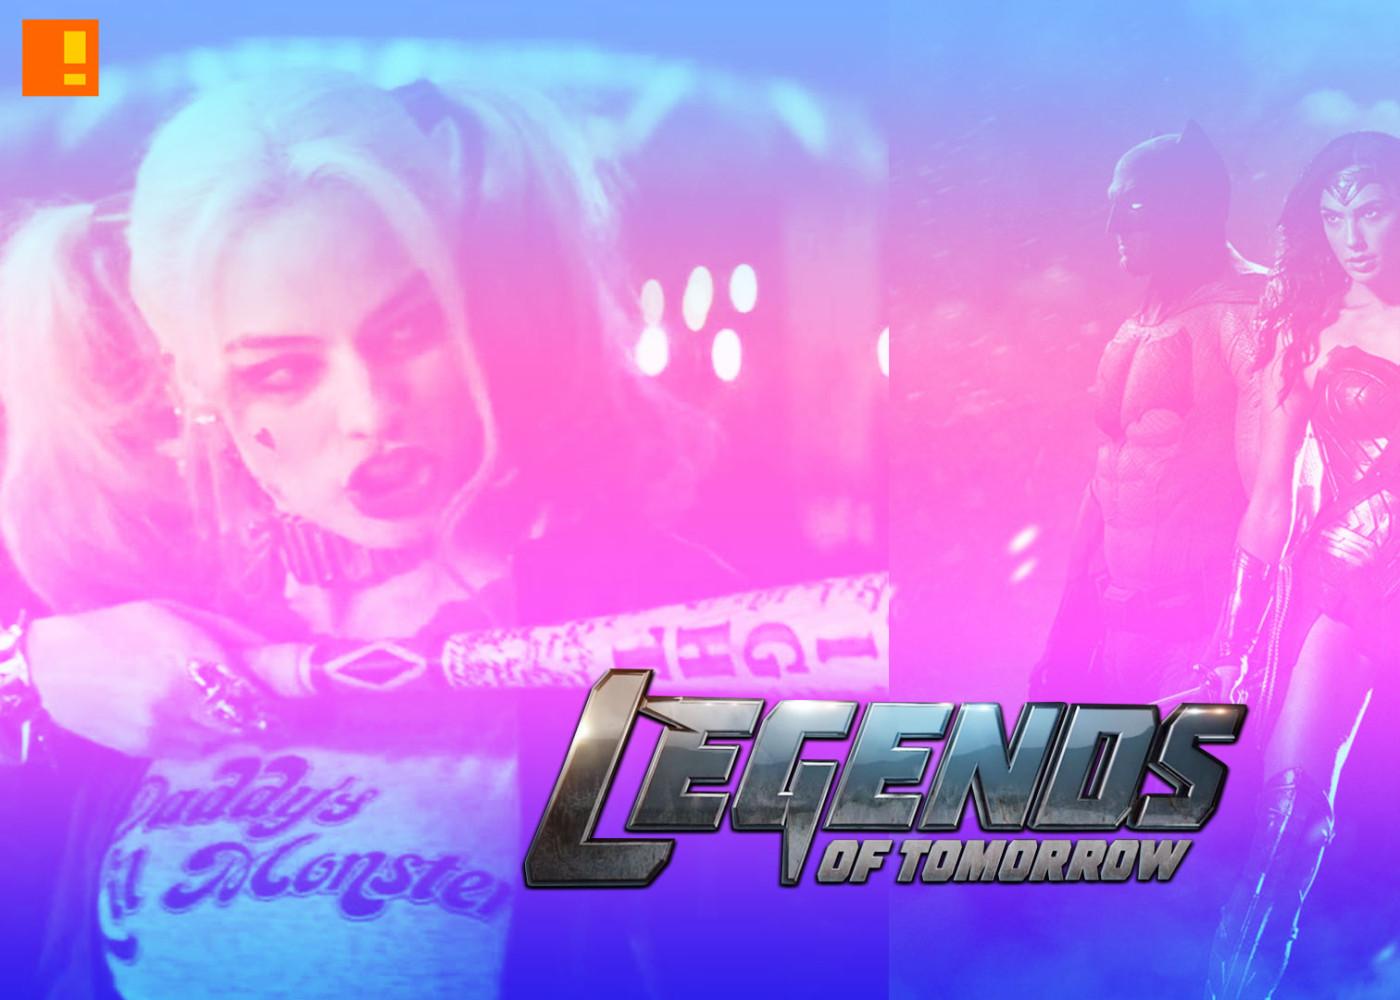 legends of tomorrow. suicide squad. batman vs superman. dawn of justice. the CW network. dc comics. entertainment on tap,